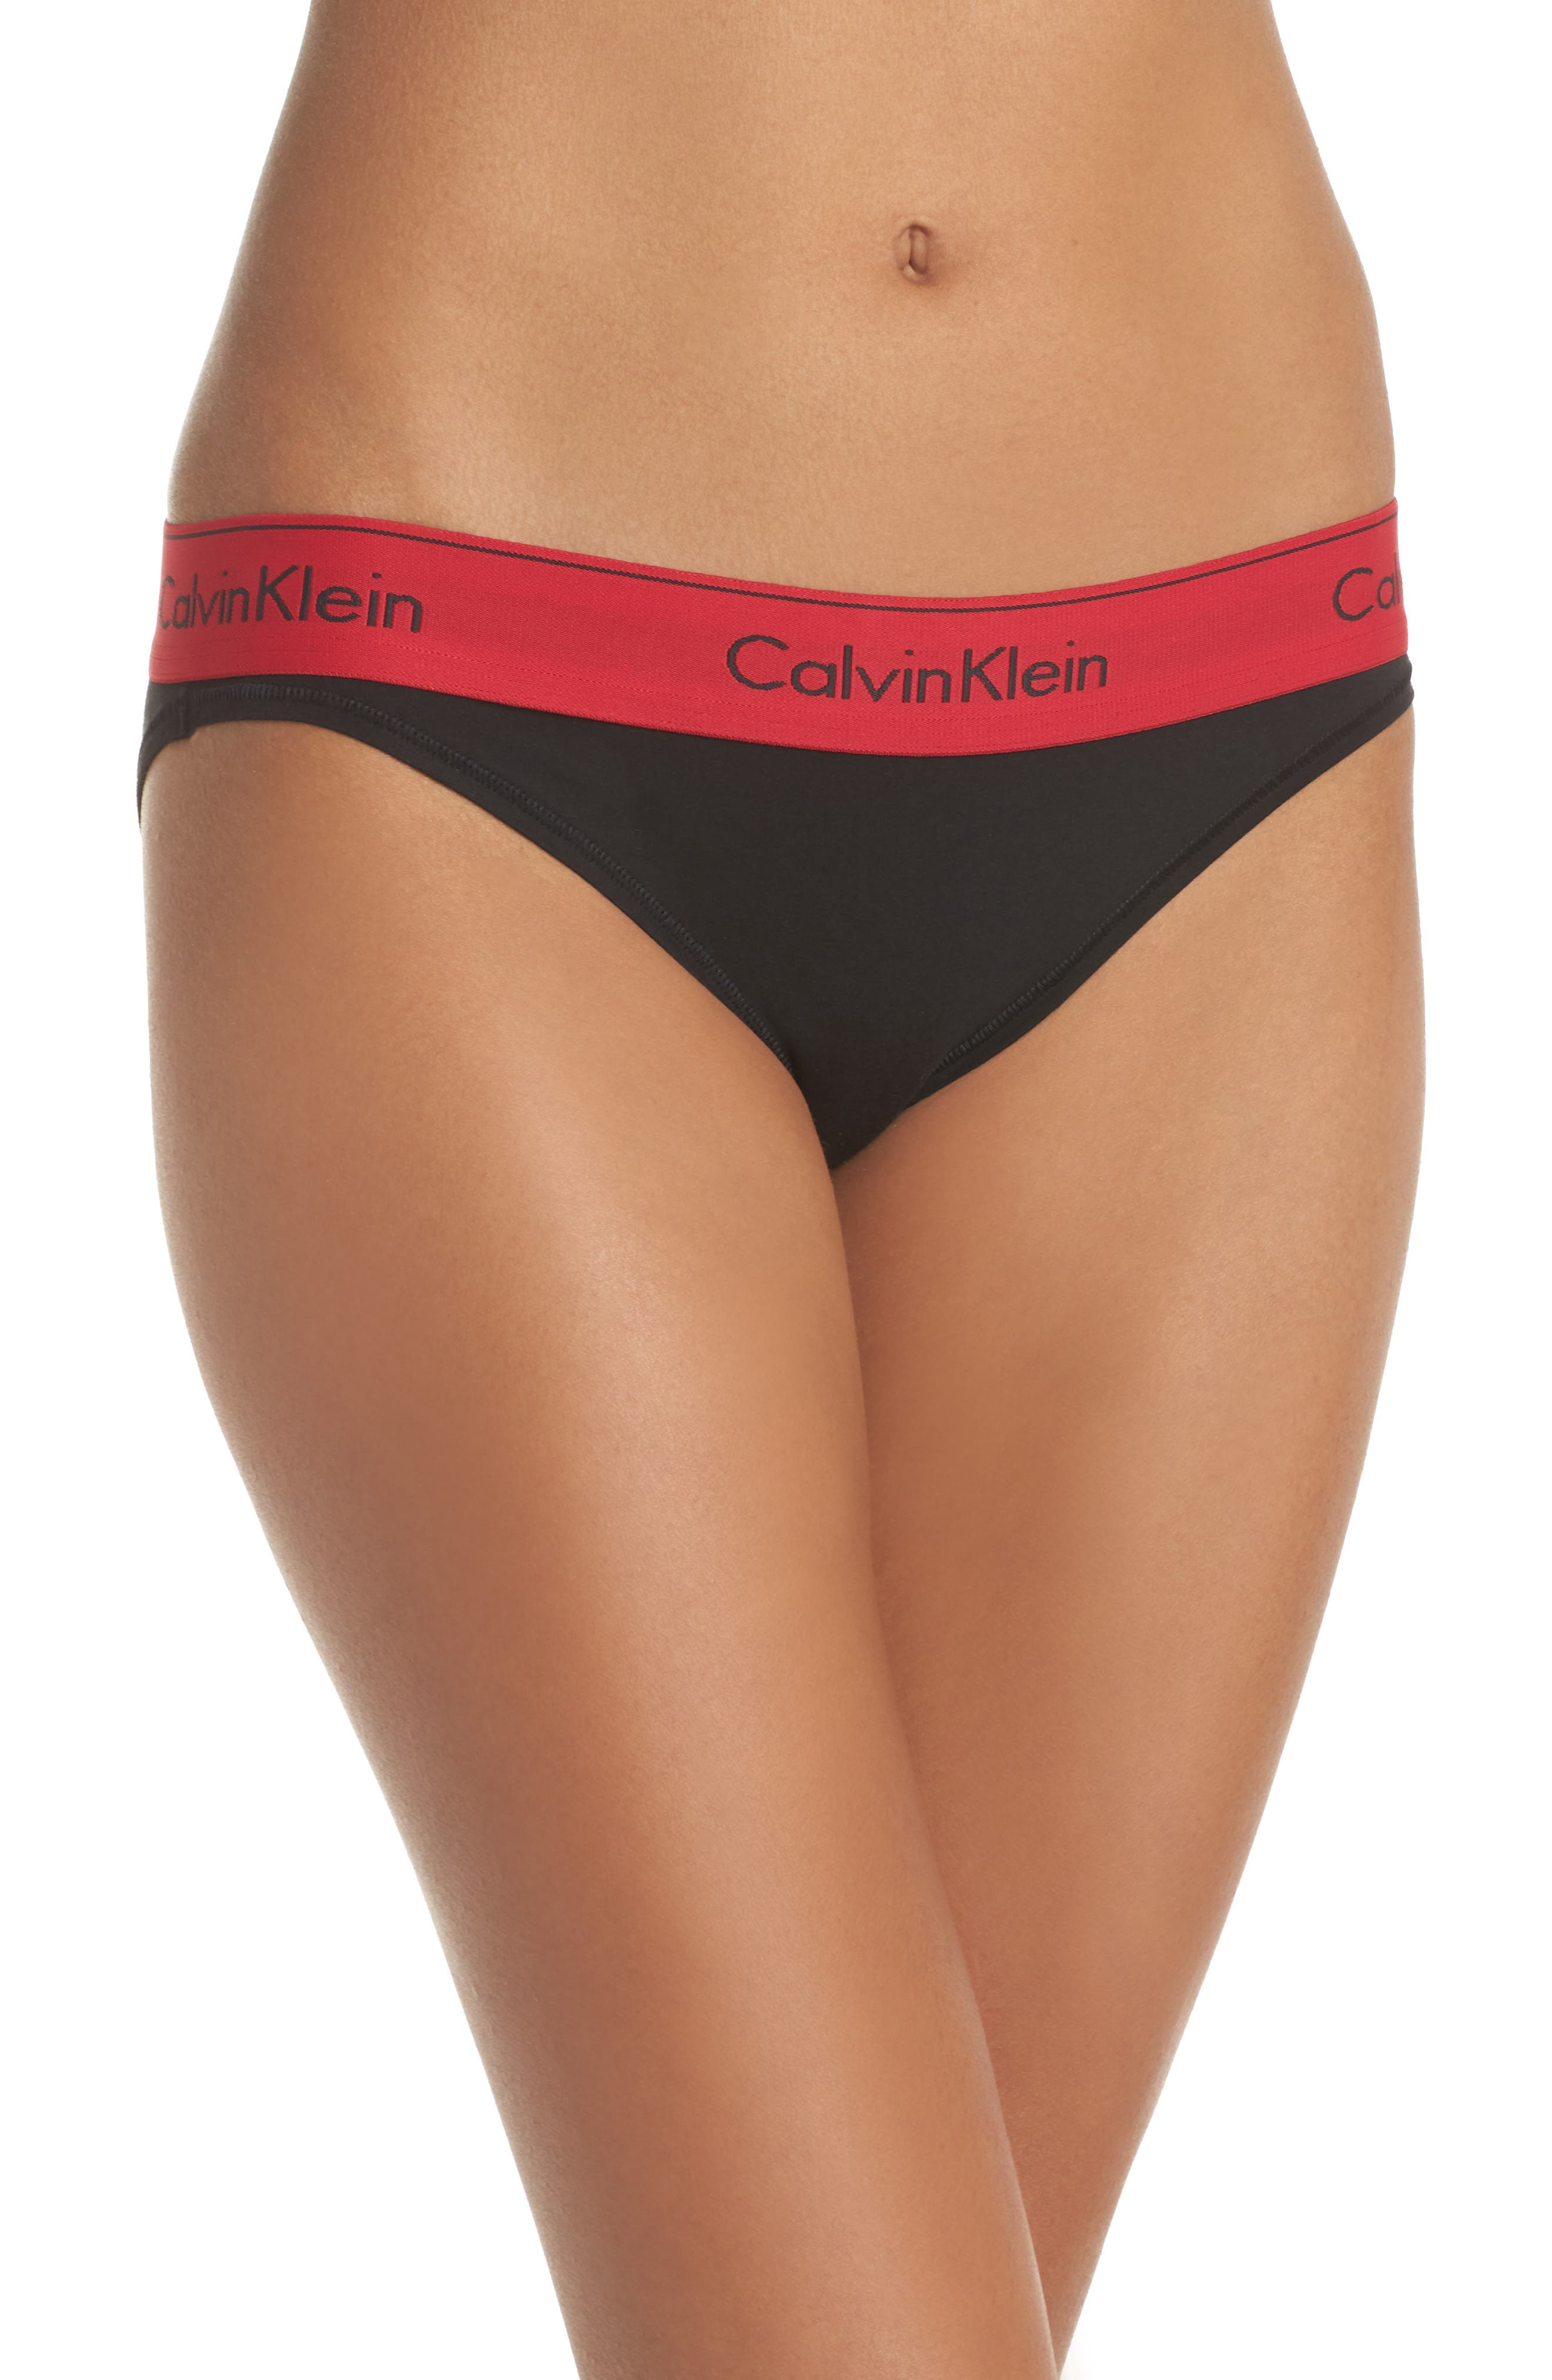 'Modern Cotton Collection' Cotton Blend Bikini,                         Main,                         color, Black Empower